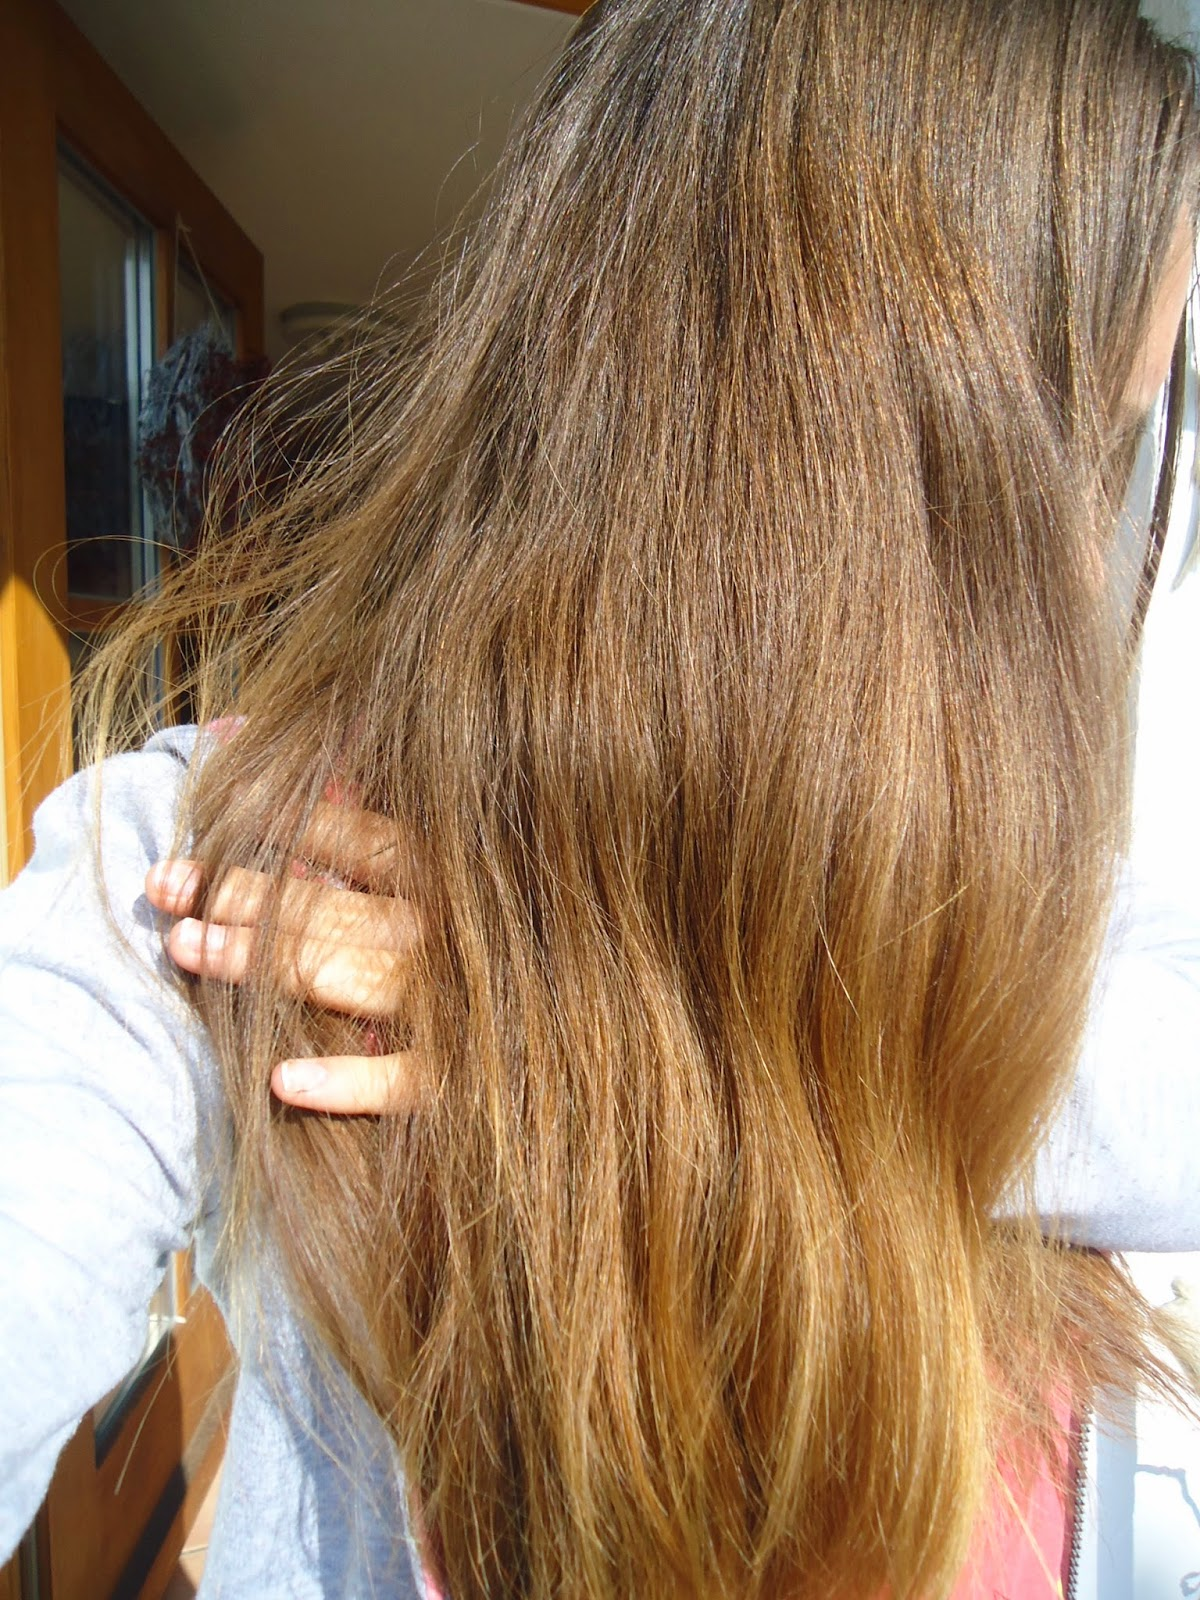 grün shampoo gegen rotstich